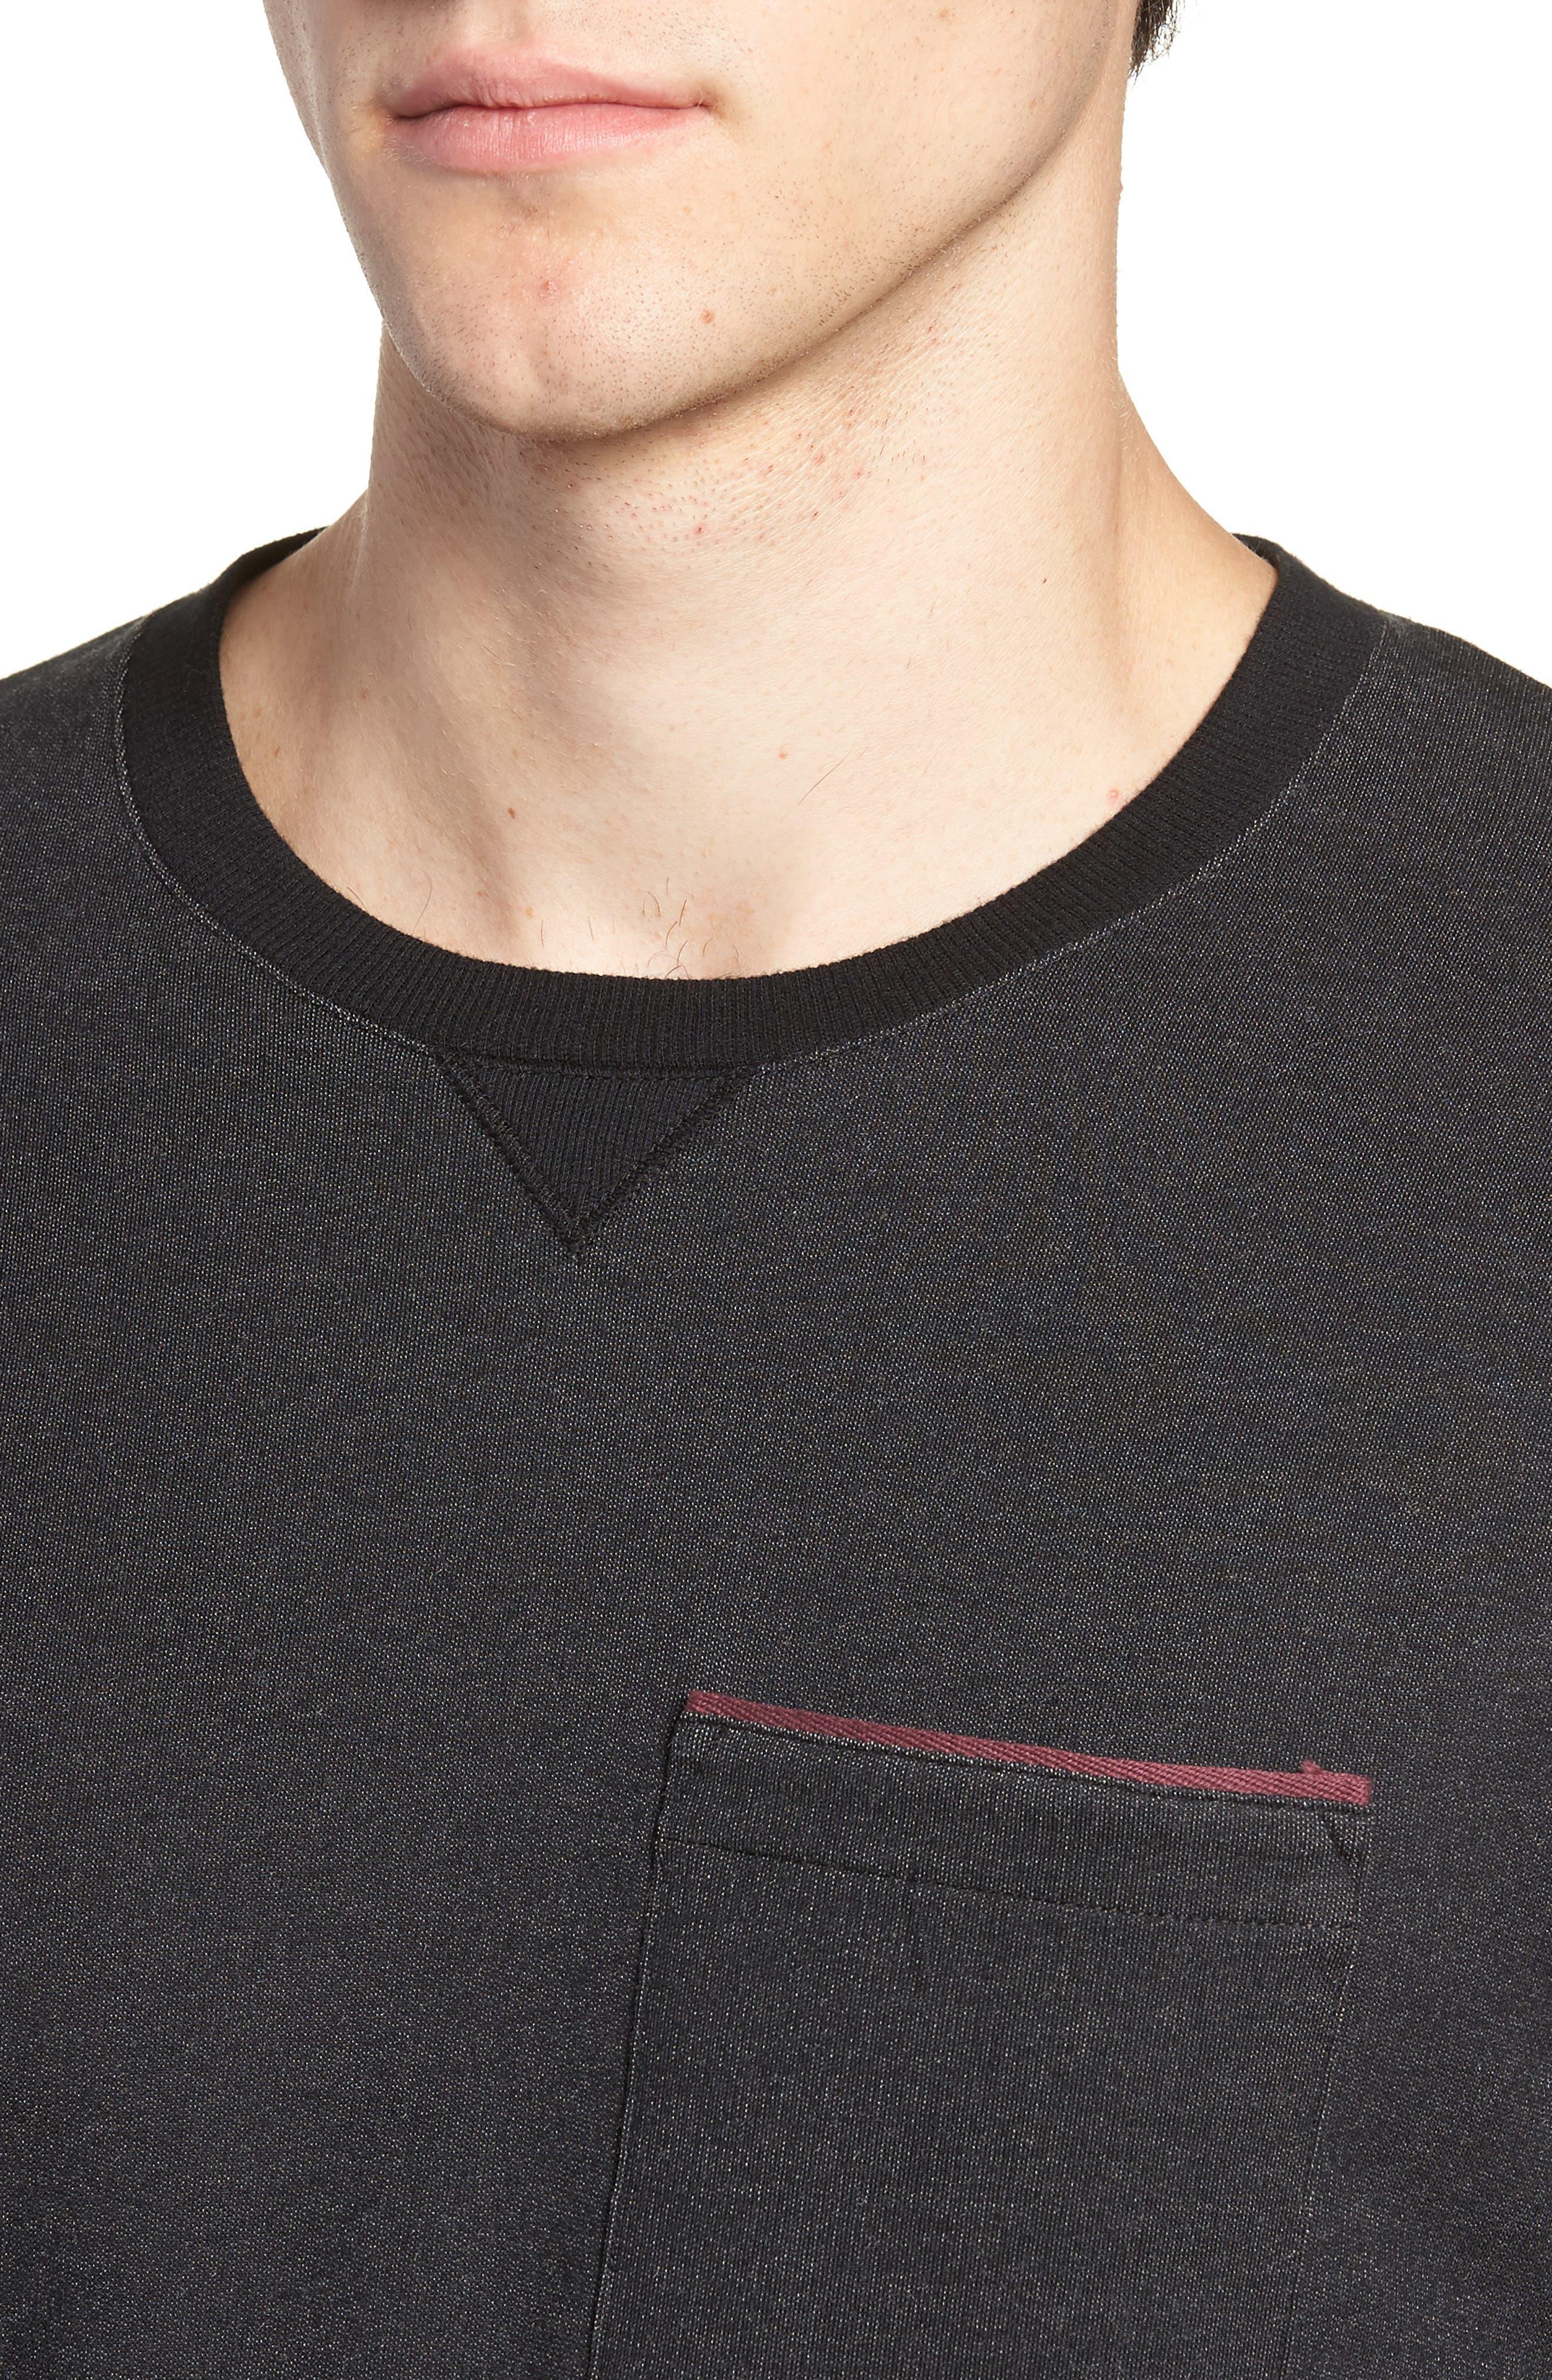 Lanegan Long Sleeve T-Shirt,                             Alternate thumbnail 4, color,                             BLACK/ WINETASTING